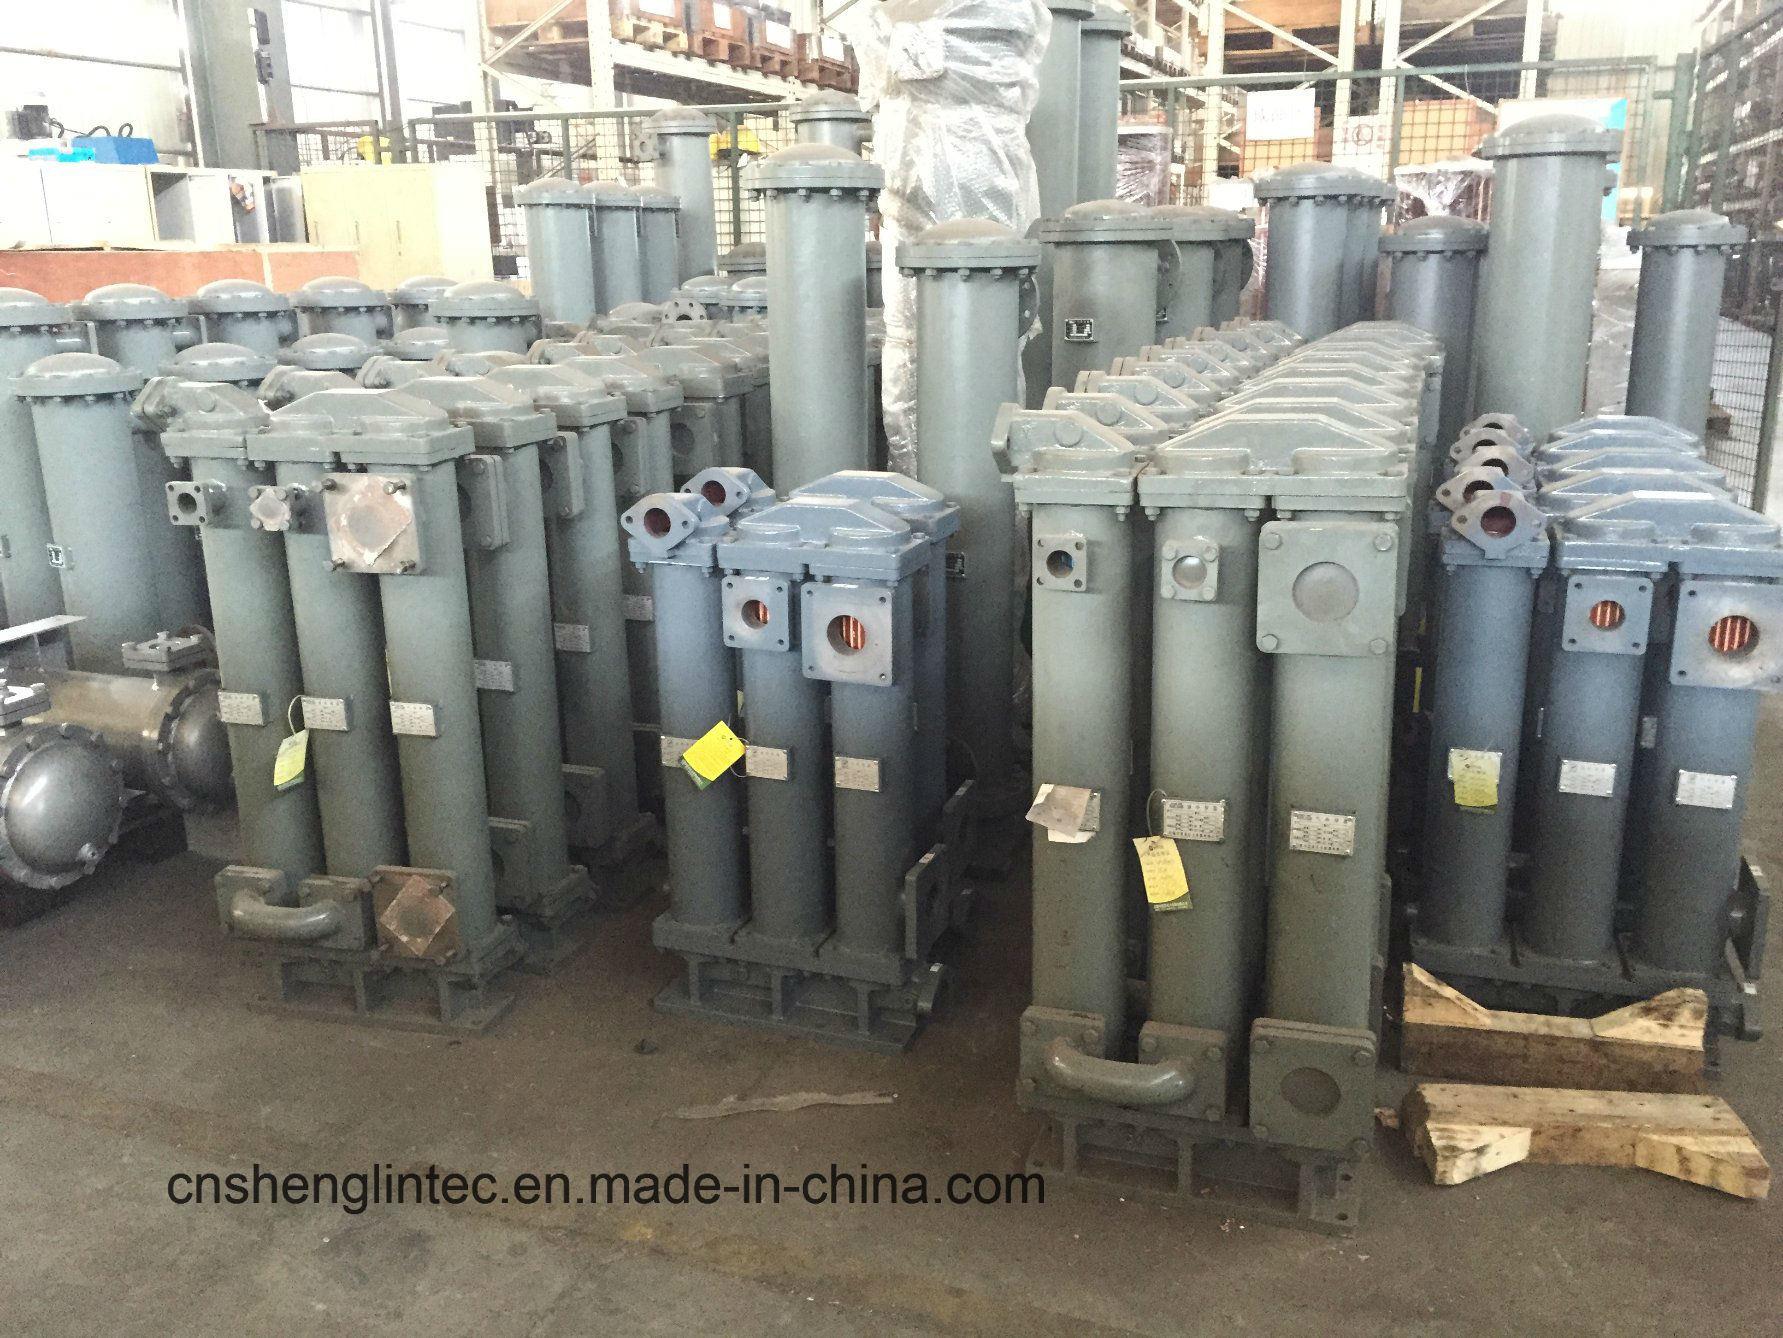 Hotsale Standard Compressor Intercooler